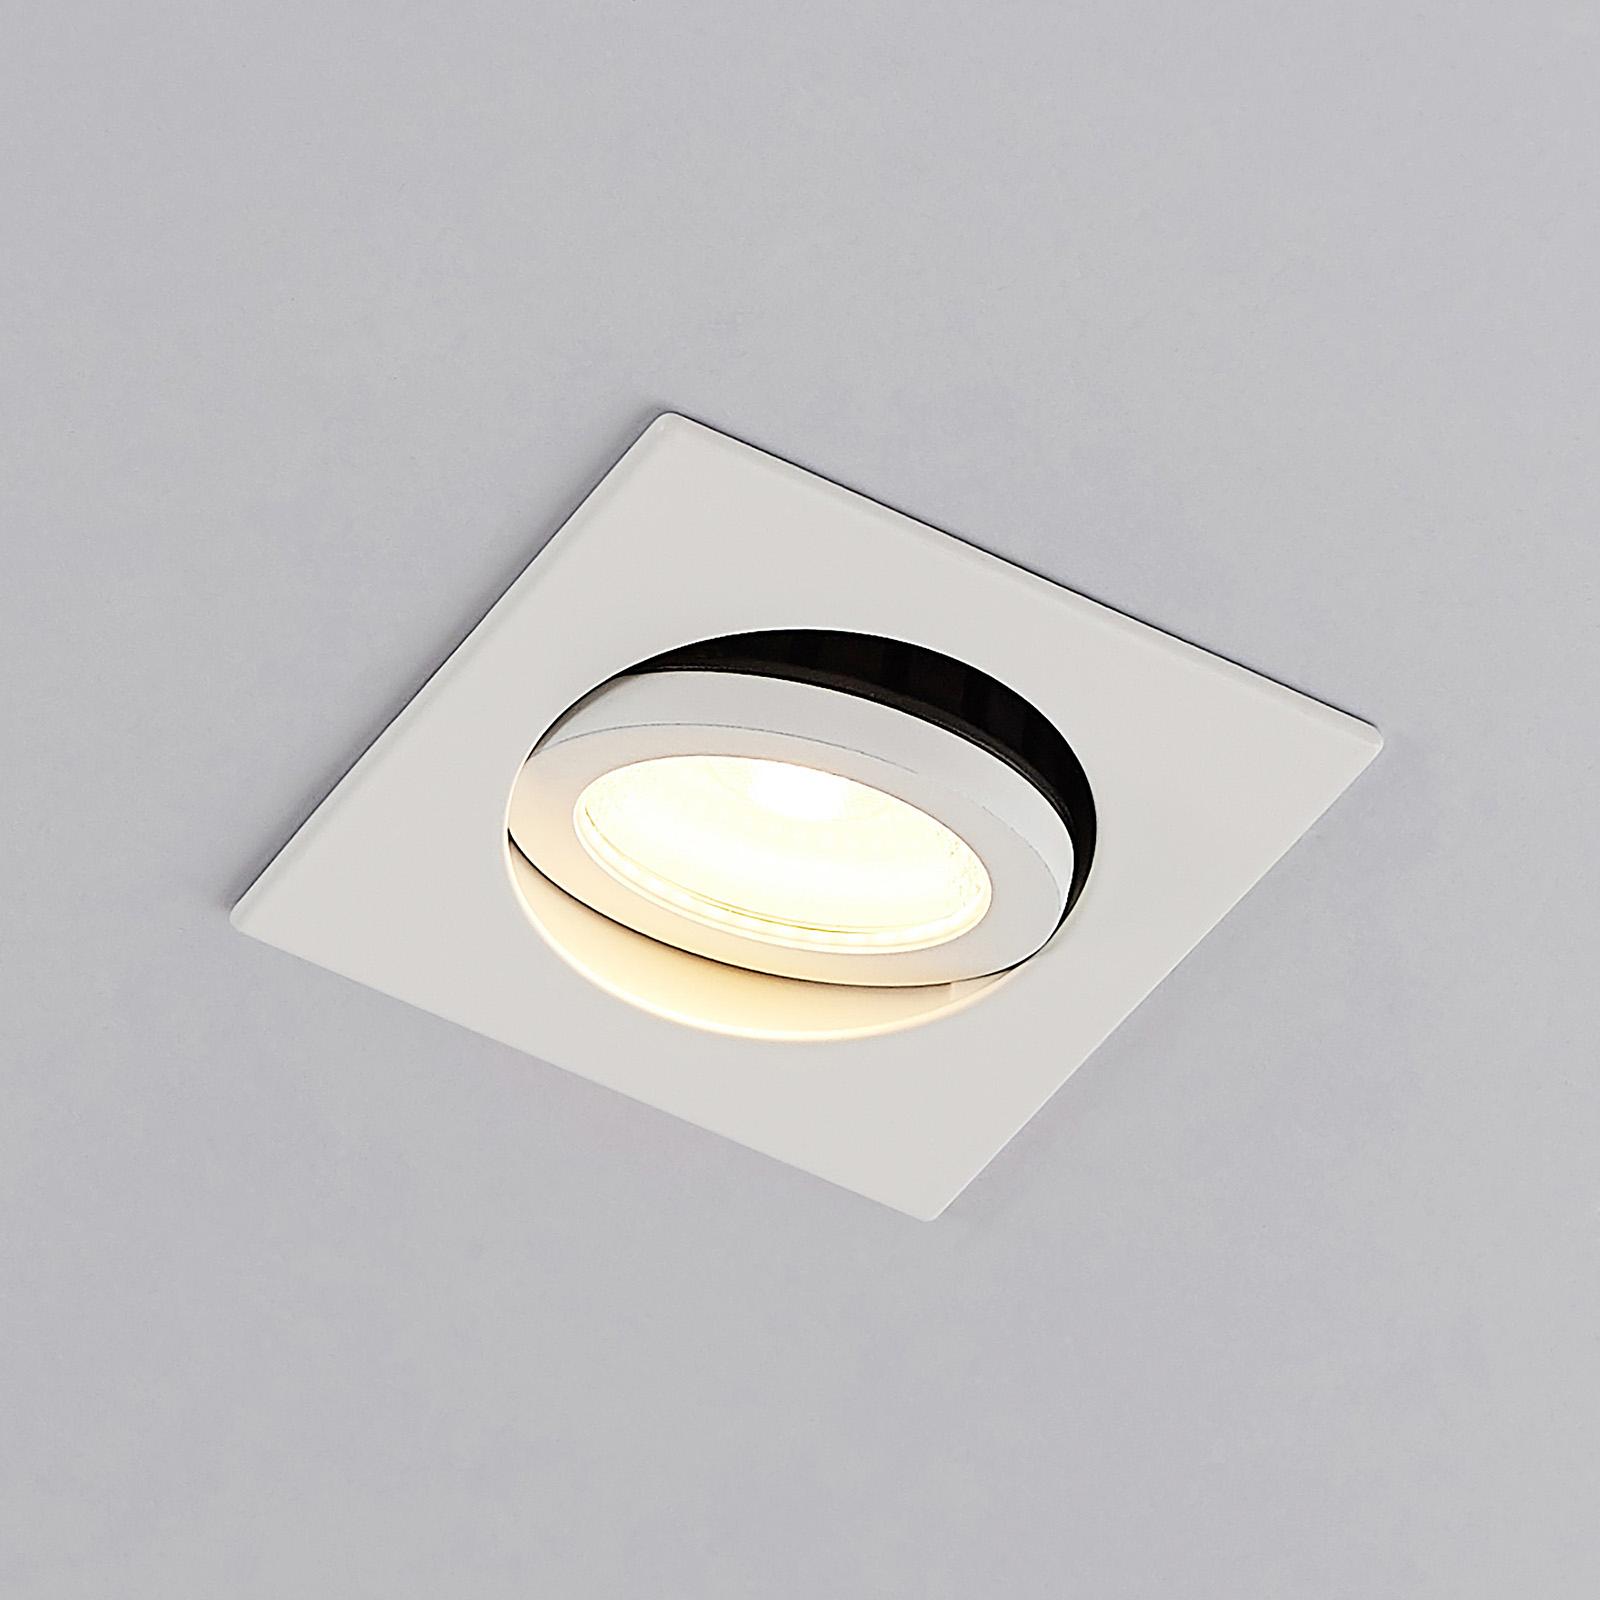 Arcchio Dacio LED-Downlight eckig 36° IP65, 4W